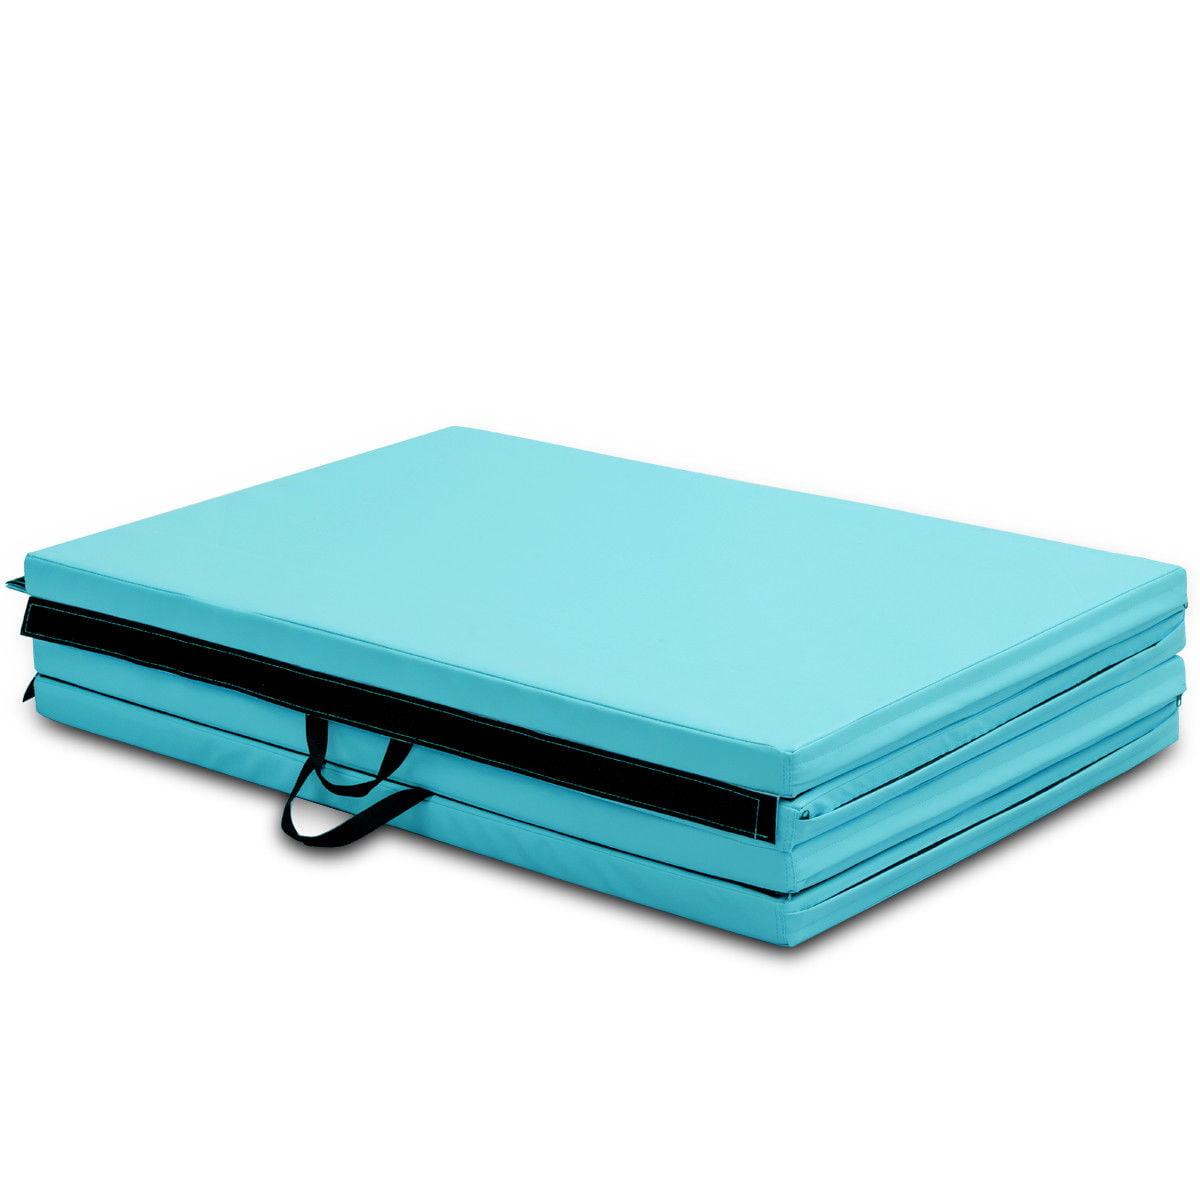 "4'x10'x2"" Gymnastics Mat Thick Folding Panel Aerobics Exercise Gym Fitness Blue - image 7 de 8"